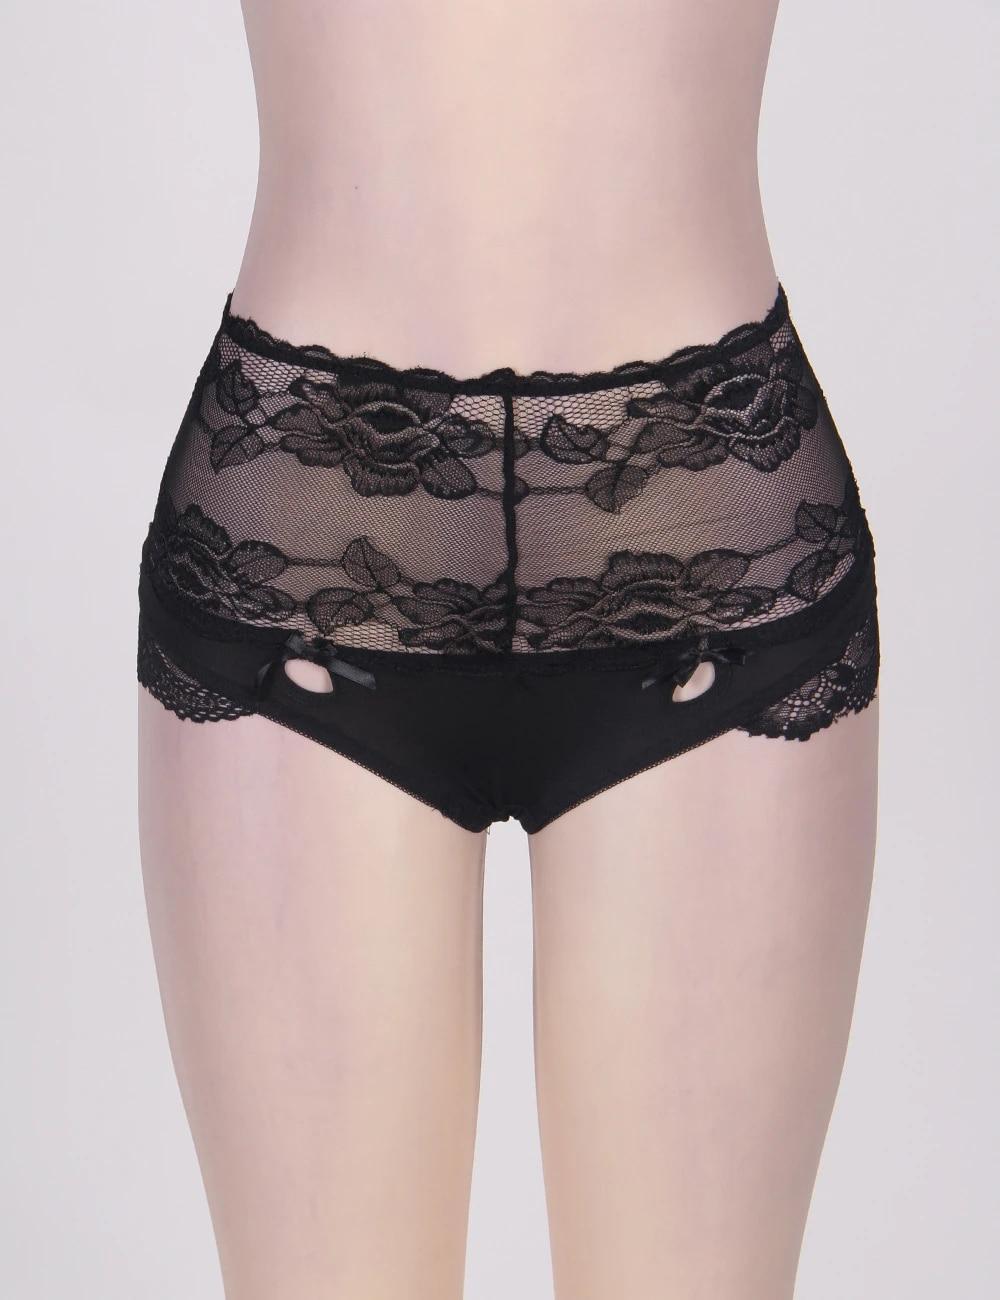 culotte haute femme grande taille coloris noir taille XXL